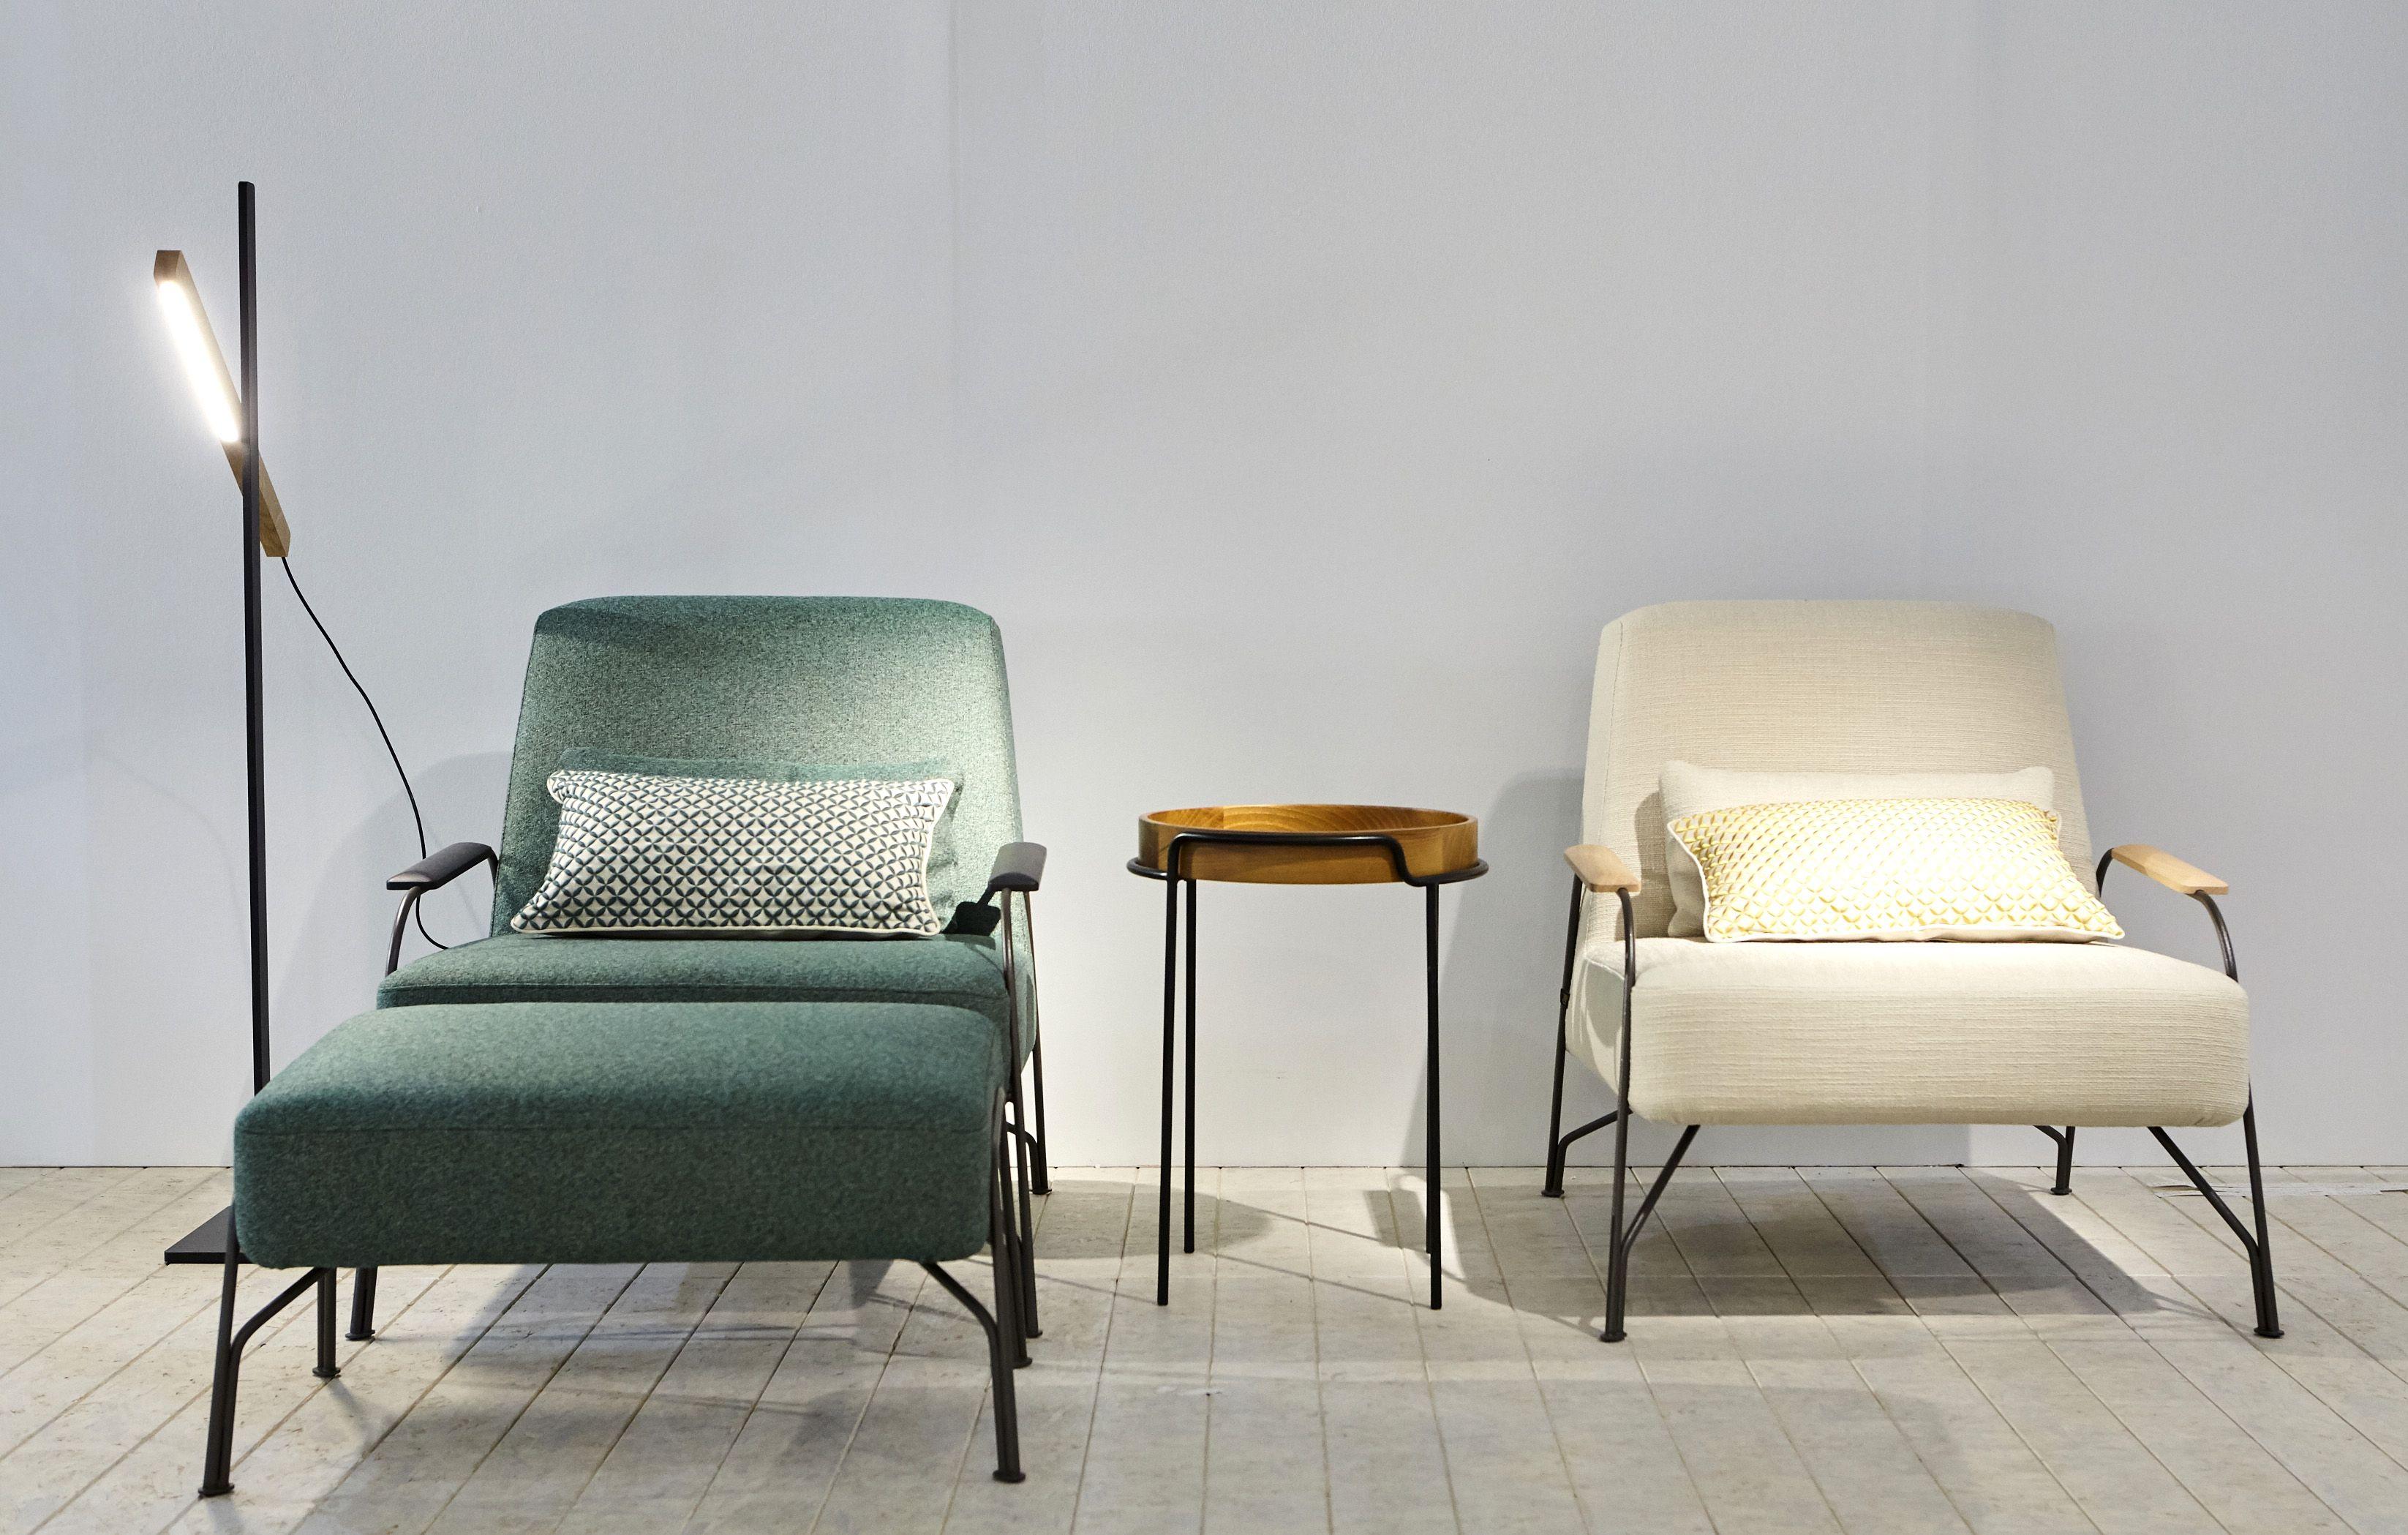 maison objet 2017 cinna fauteuils humphrey de. Black Bedroom Furniture Sets. Home Design Ideas